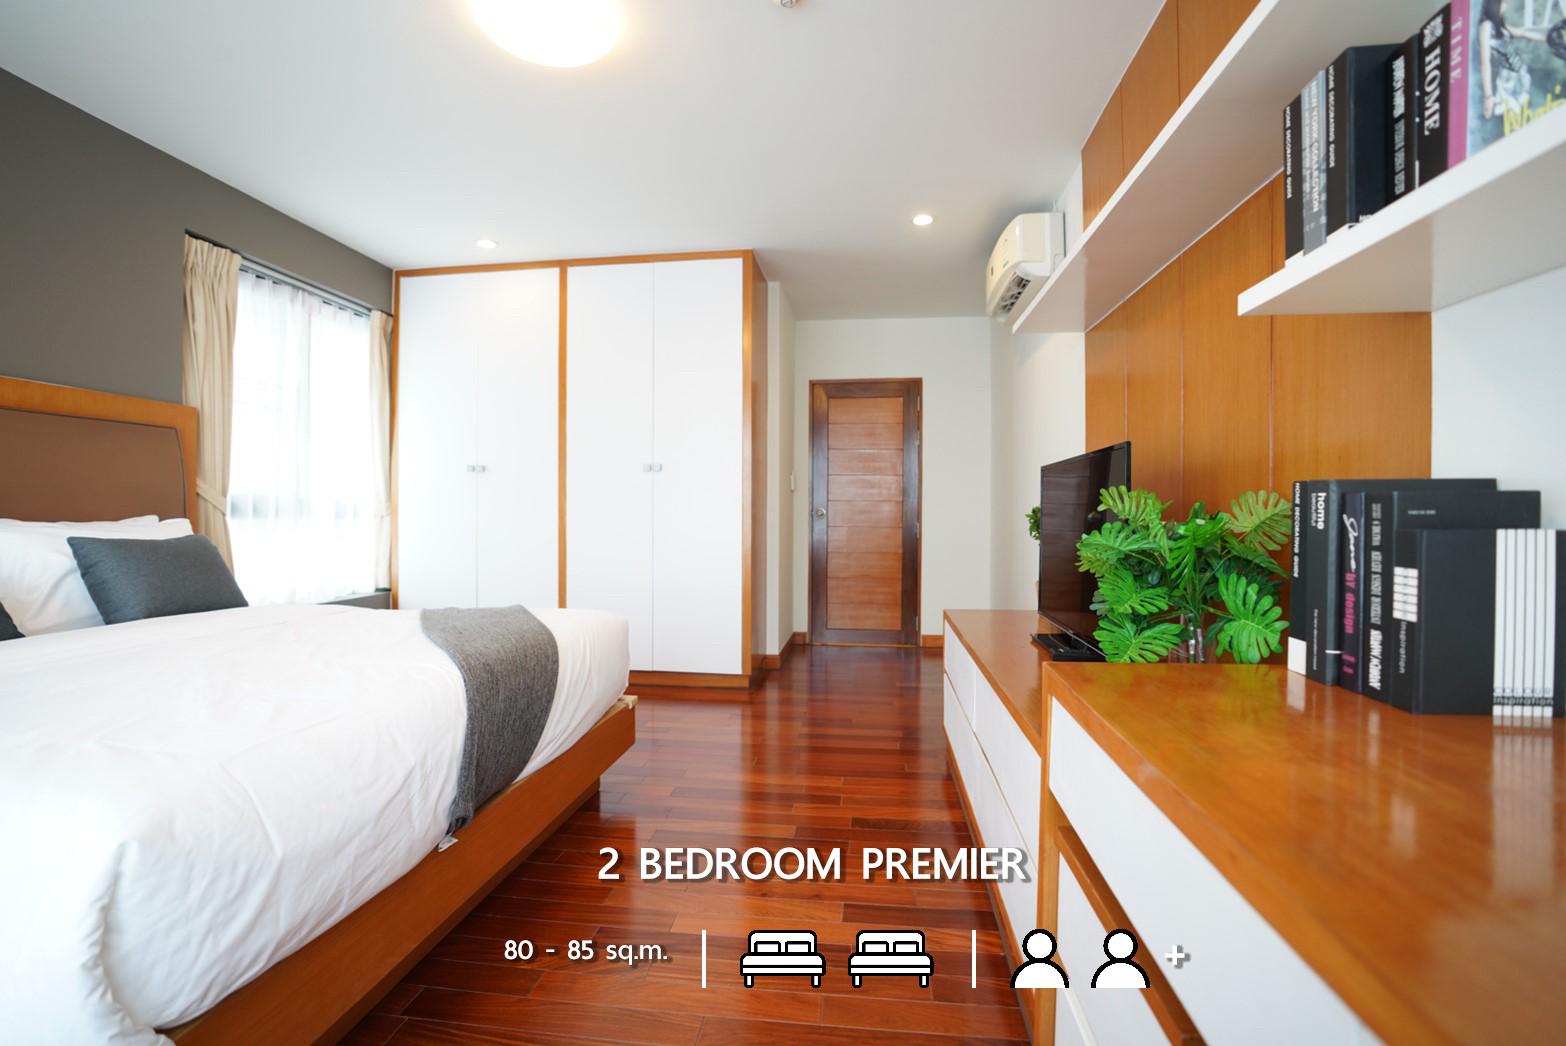 2 Bedroom Premier Sunshine Sriracha Hotel & Service Apartment